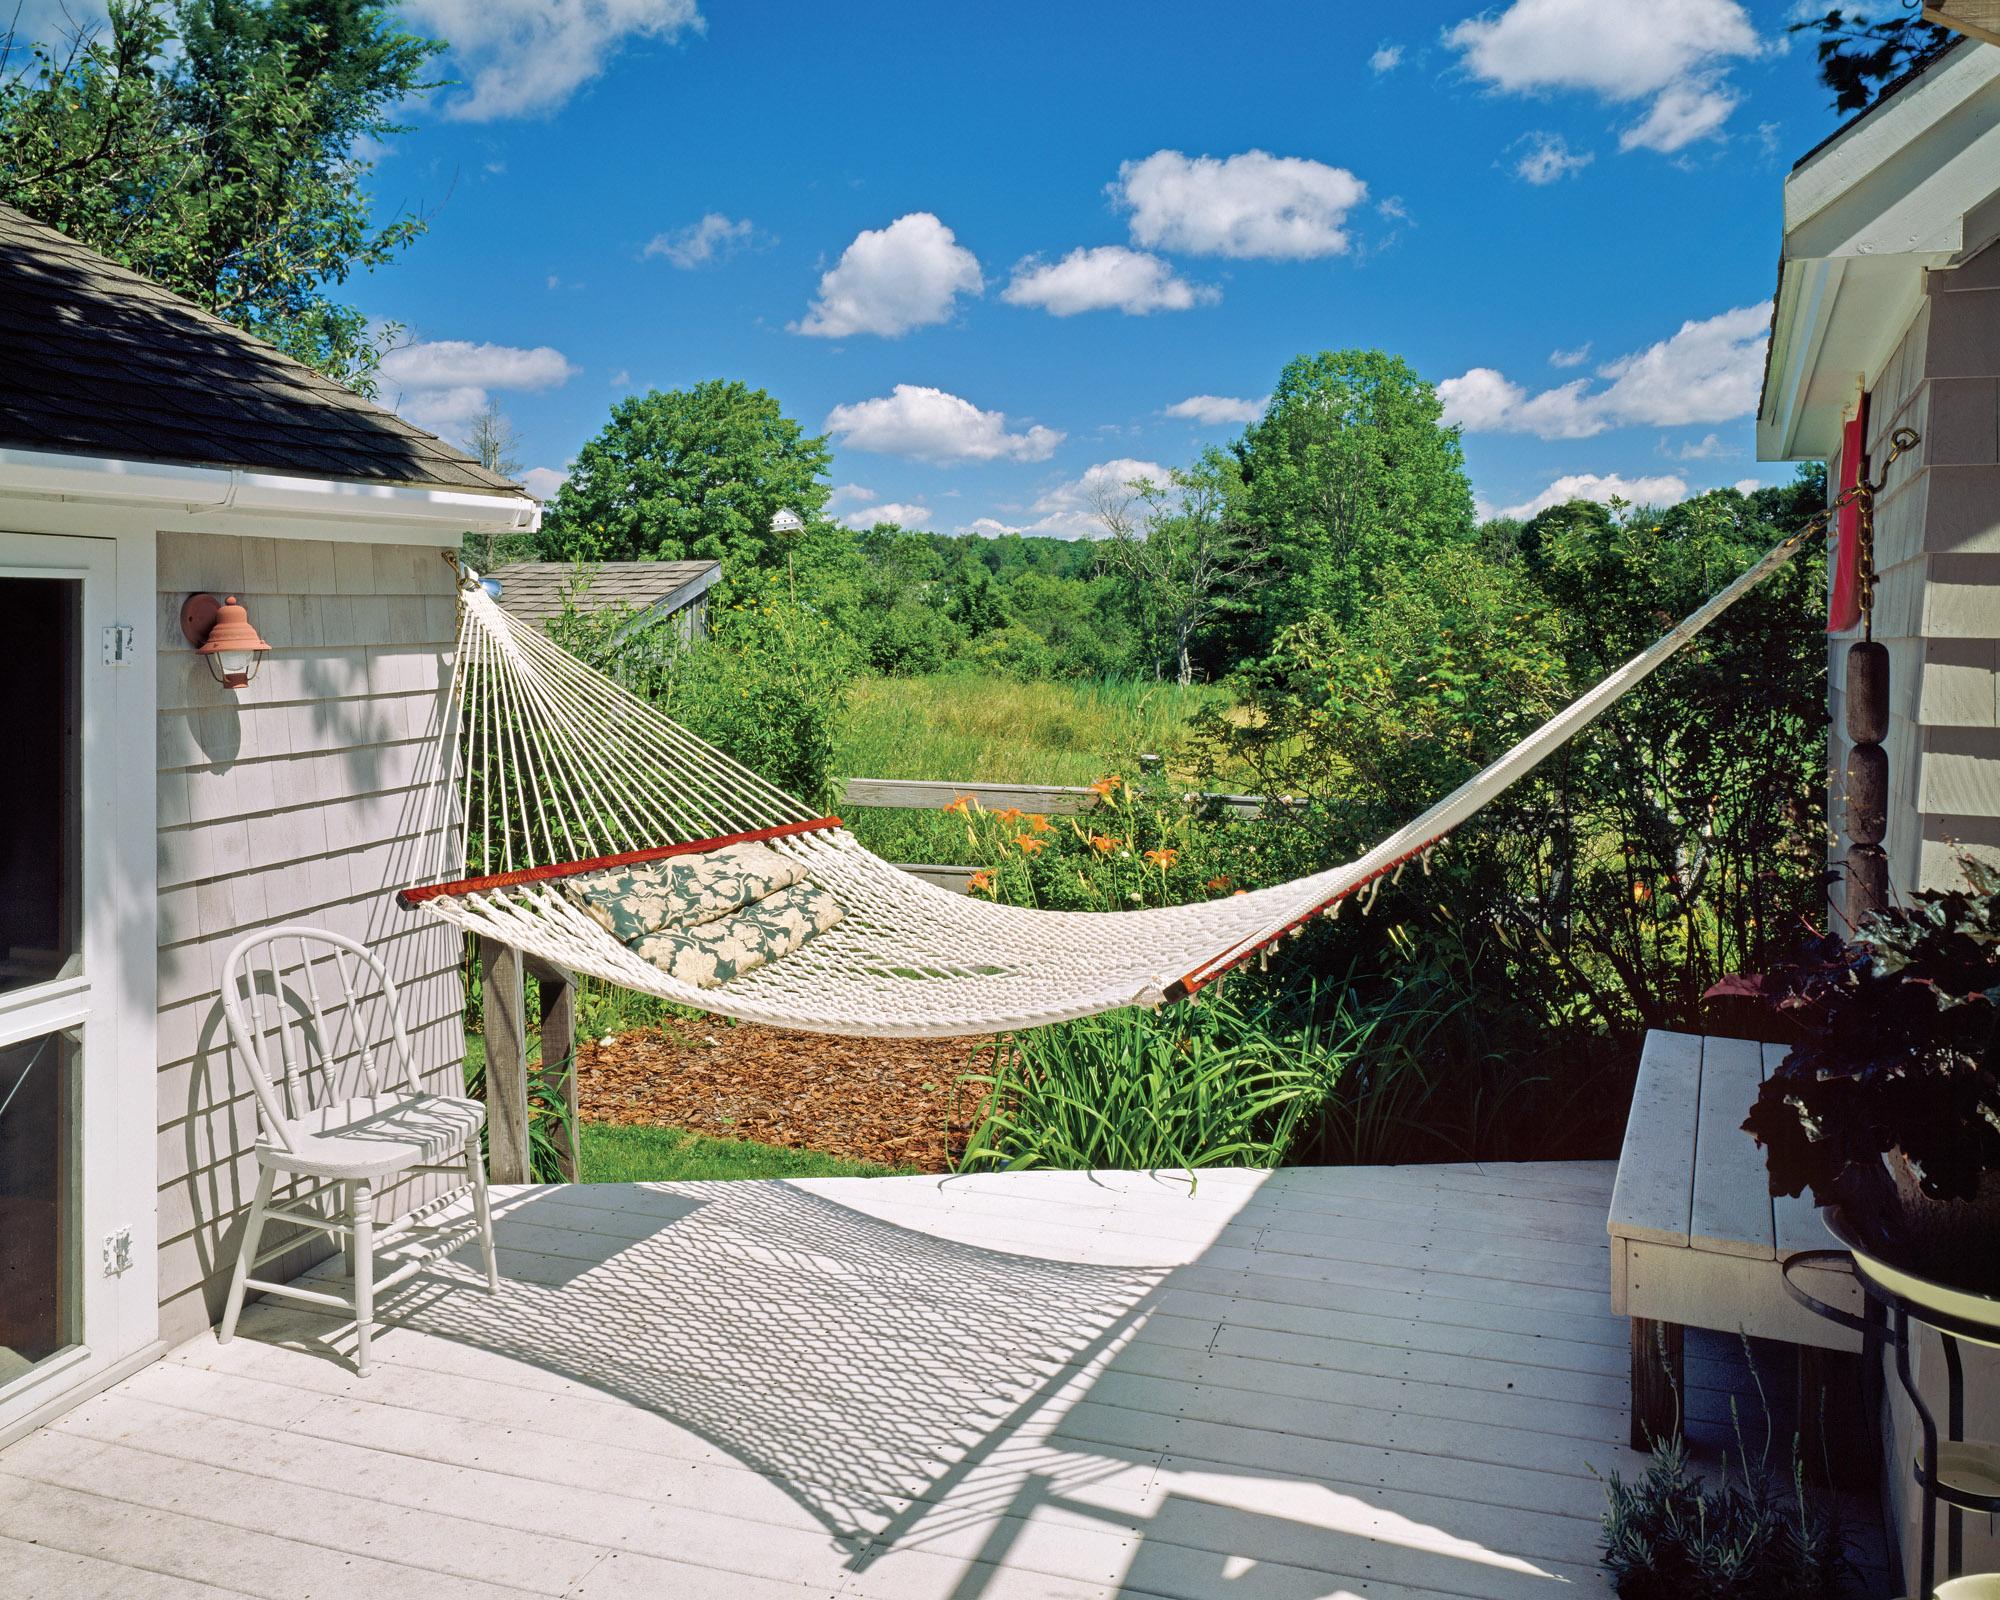 outdoor deck with hammock